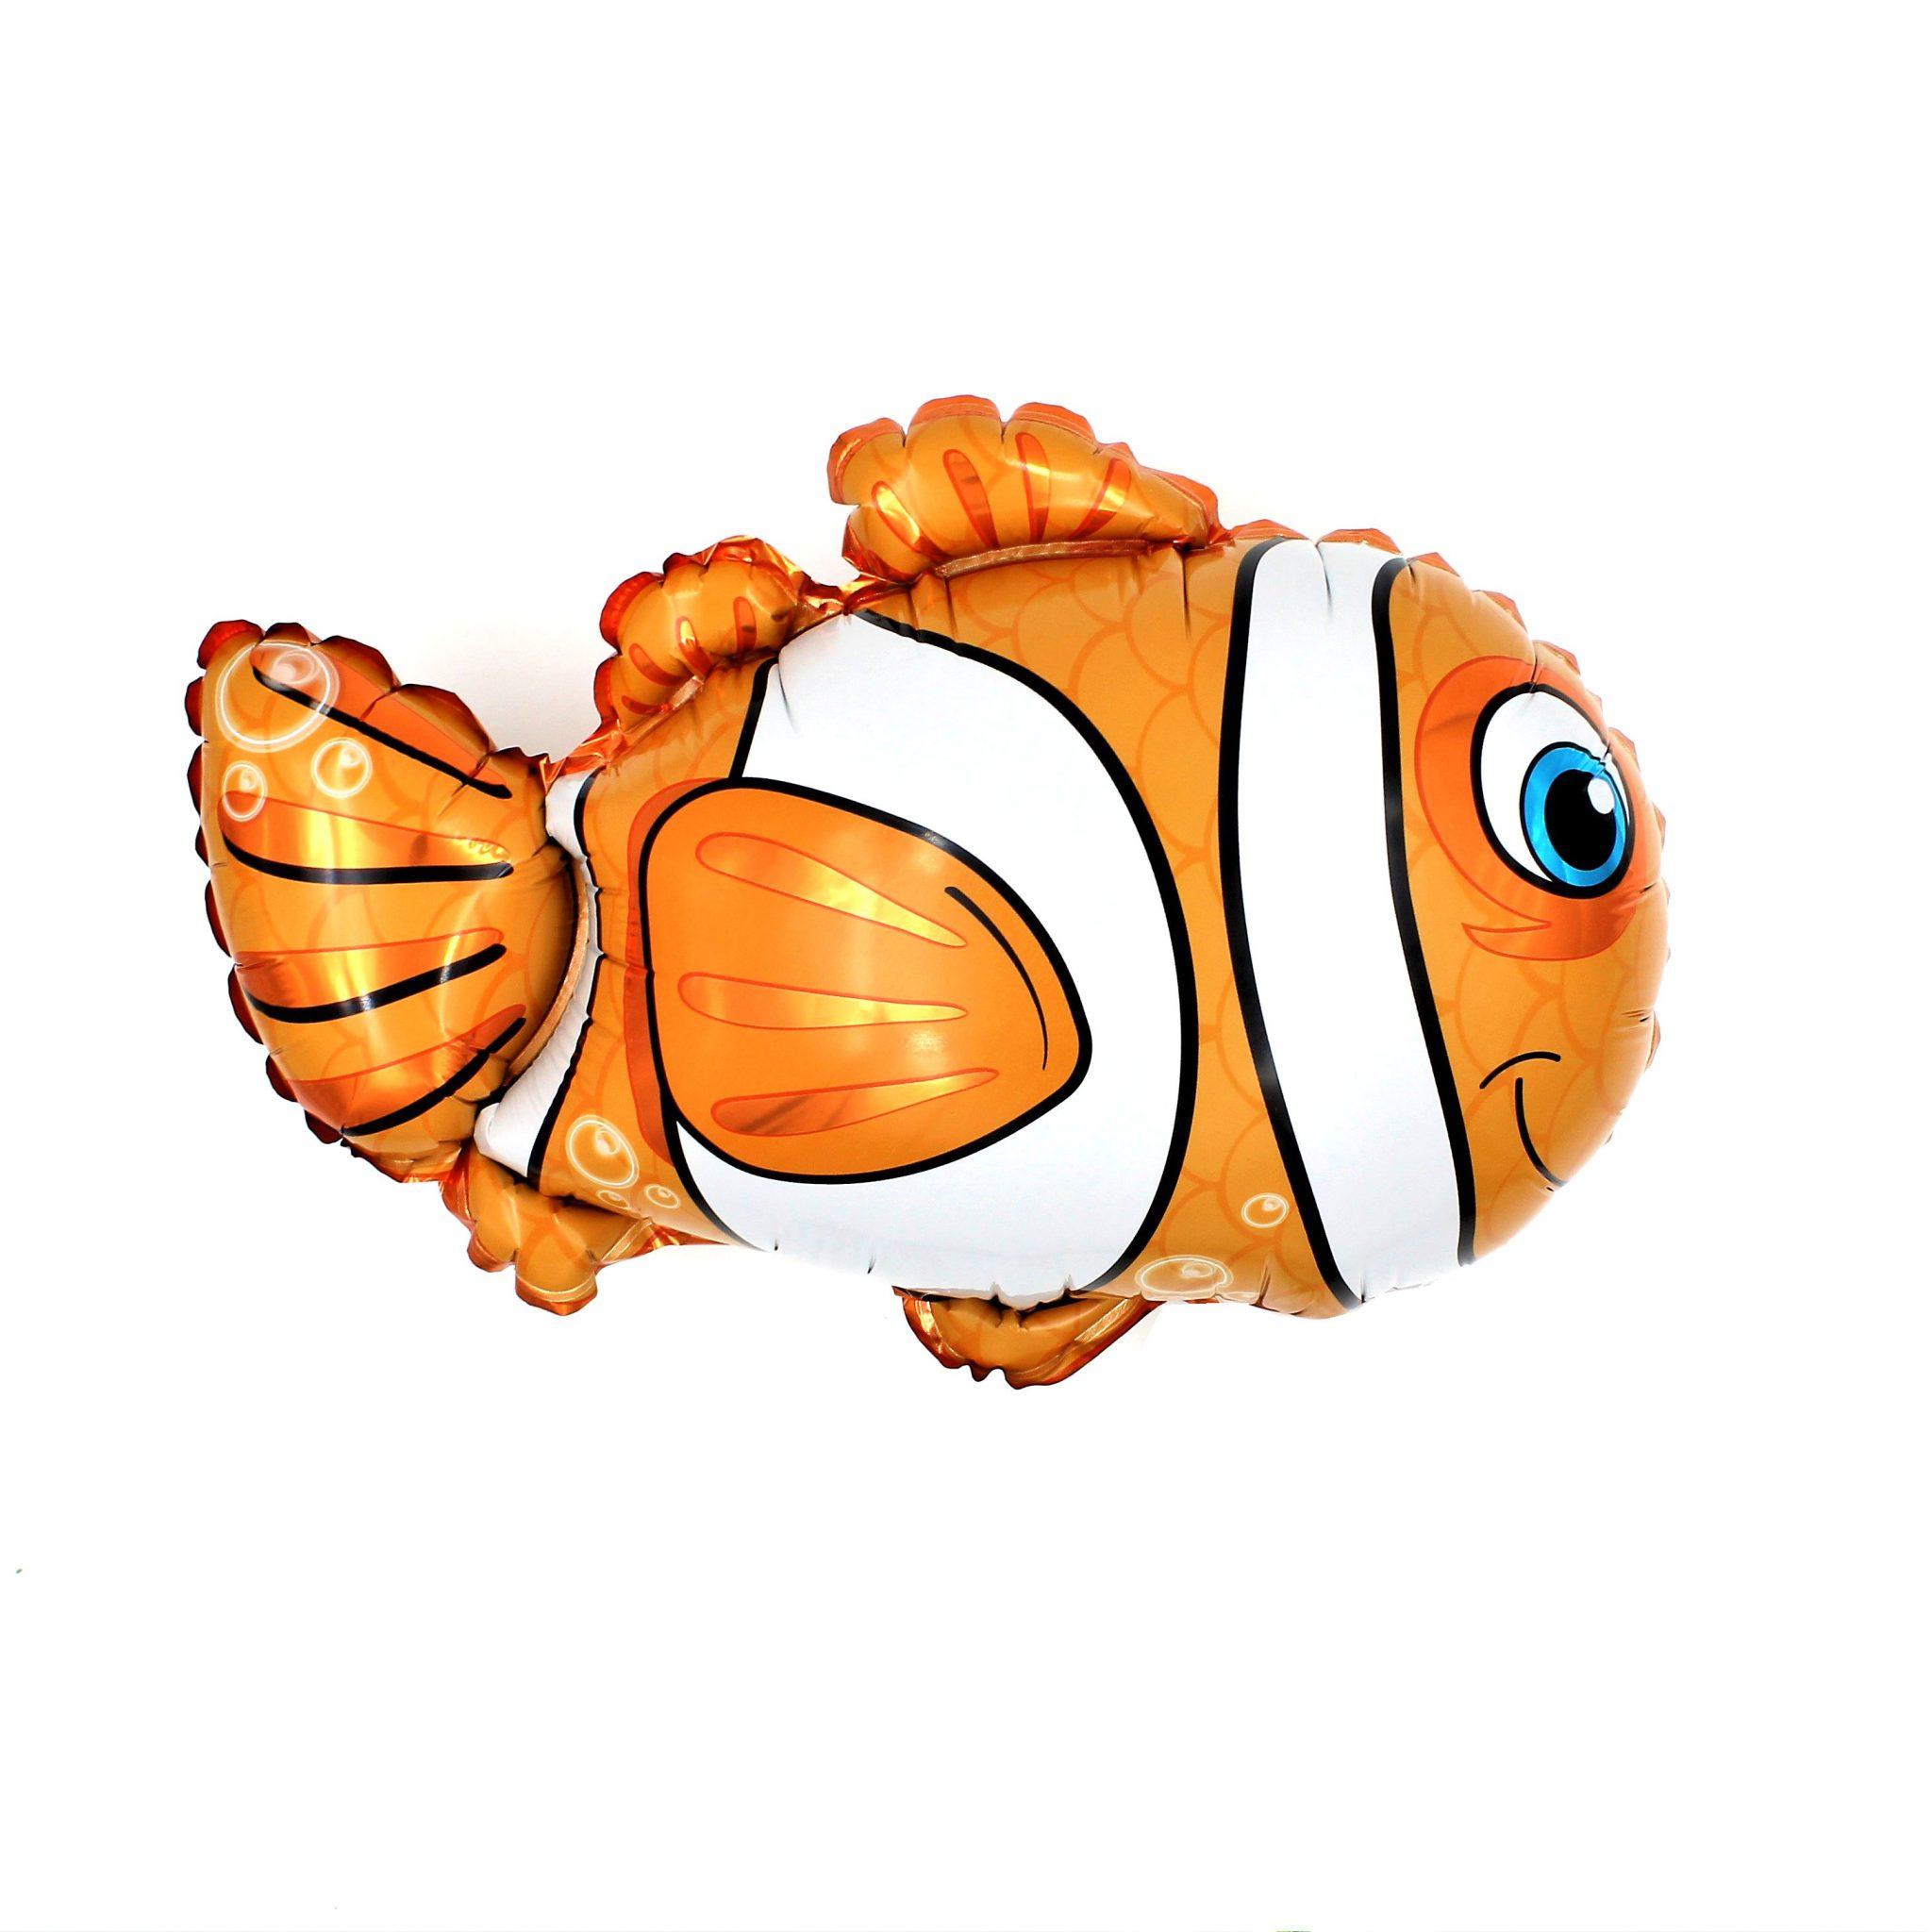 Balon zoo pentru copii Clown fish